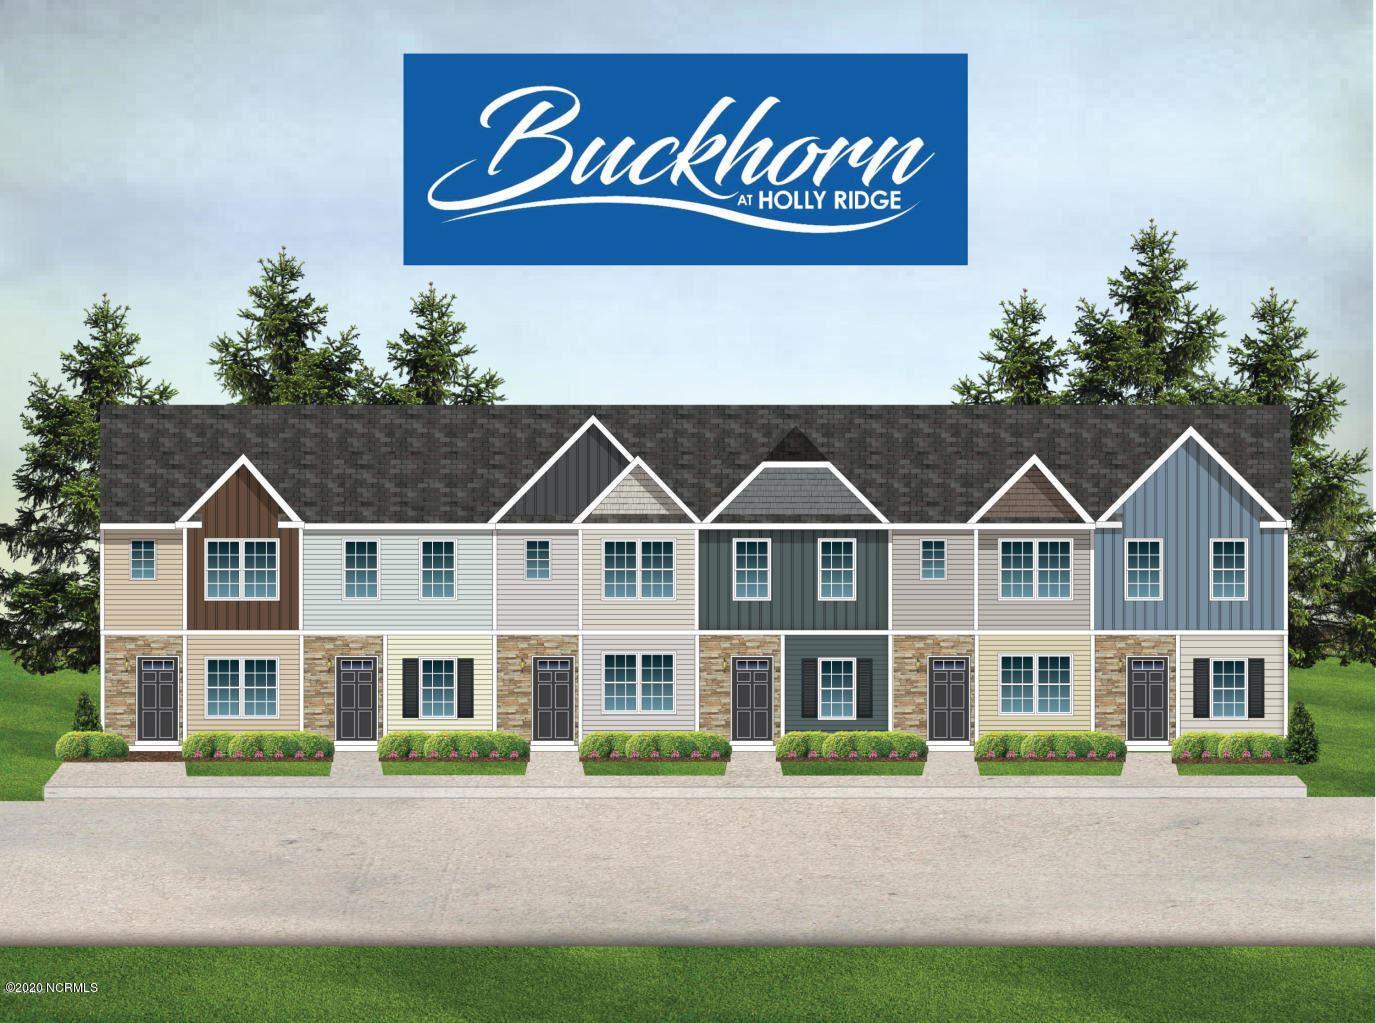 Photo for 117 Buckhorn Avenue, Holly Ridge, NC 28445 (MLS # 100188830)